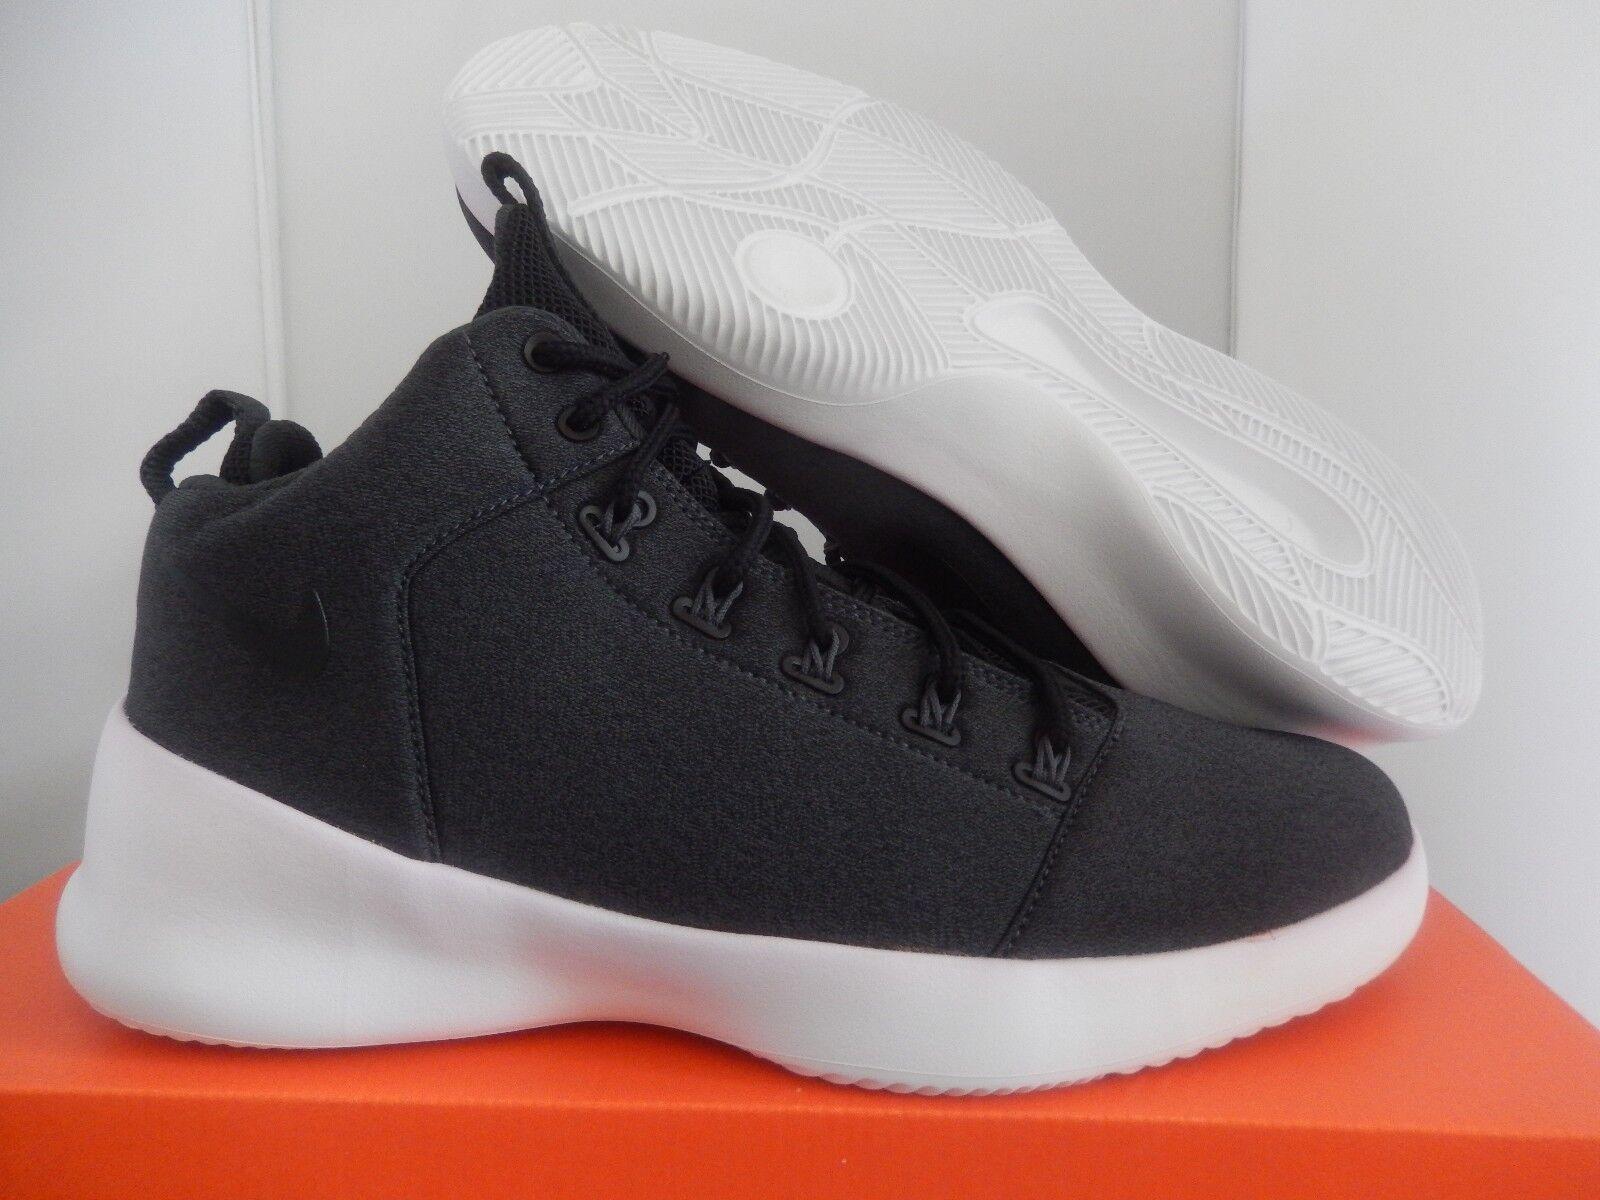 Nike hyperfr 3SH Antracita-Blanco [759996-003] [759996-003] [759996-003] 8663ee